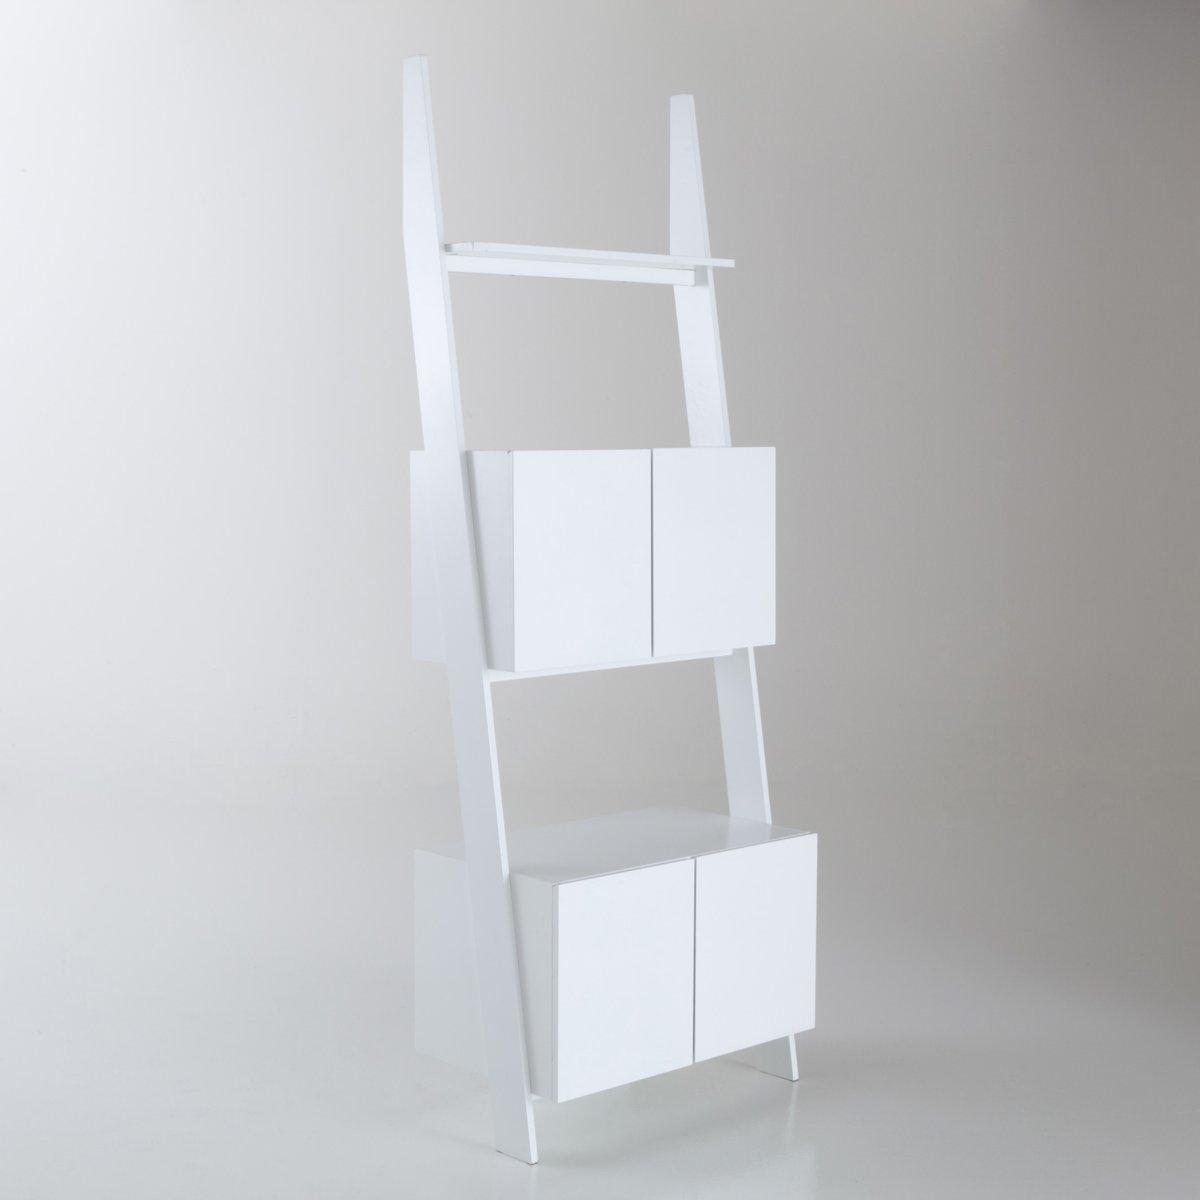 Этажерка-лестница с 4 дверцами, Domeno